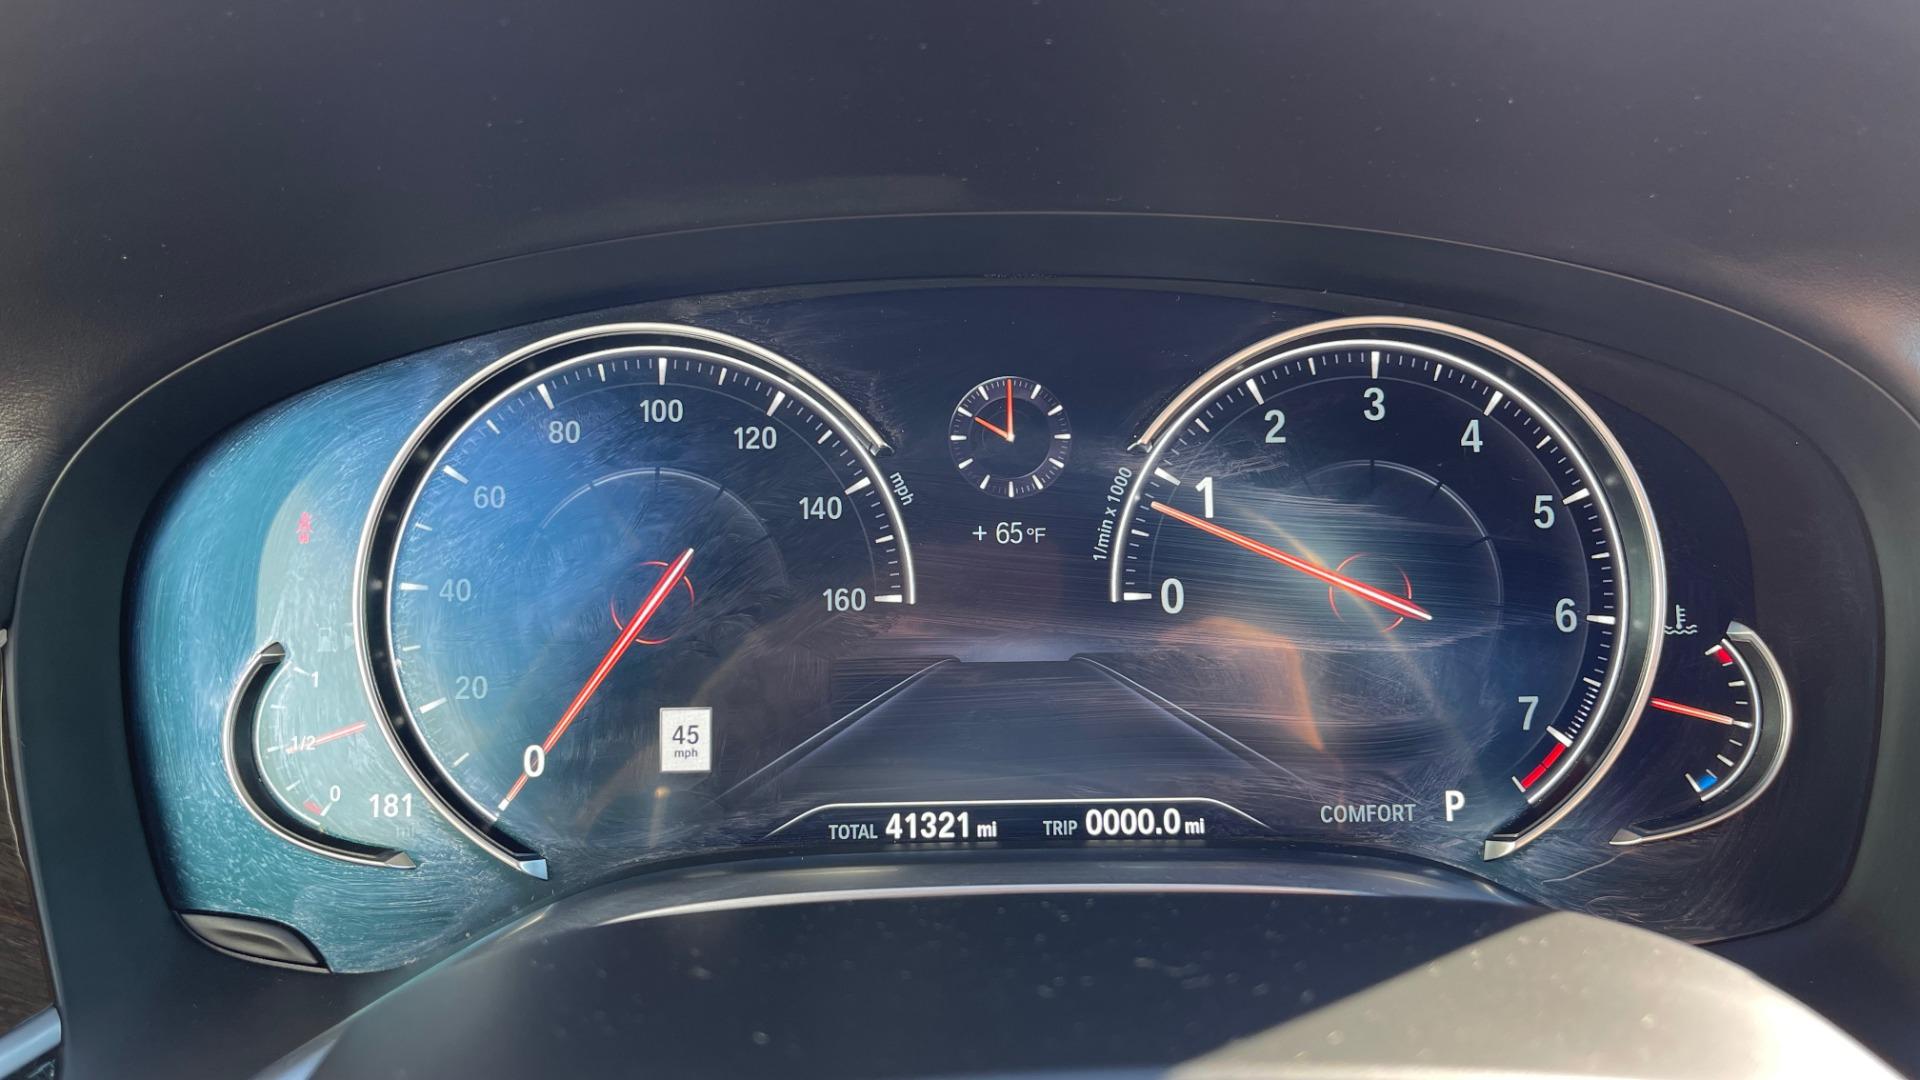 Used 2019 BMW 7 SERIES 750I XDRIVE M-SPORT / EXEC PKG / DRVR ASST PLUS / CLD WTHR / PAR for sale $60,995 at Formula Imports in Charlotte NC 28227 29